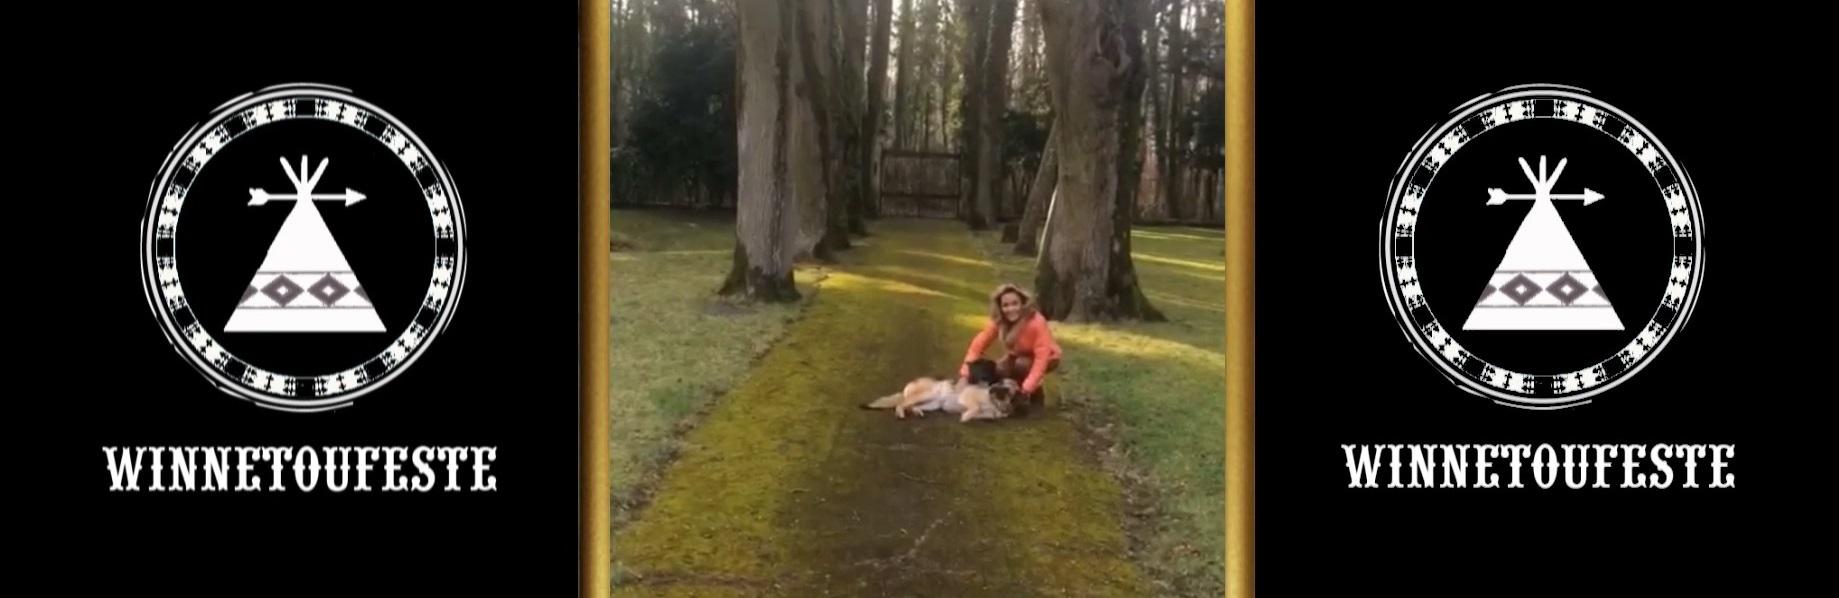 Schirmherrin Hella Brice zum Winnetoufest 2017